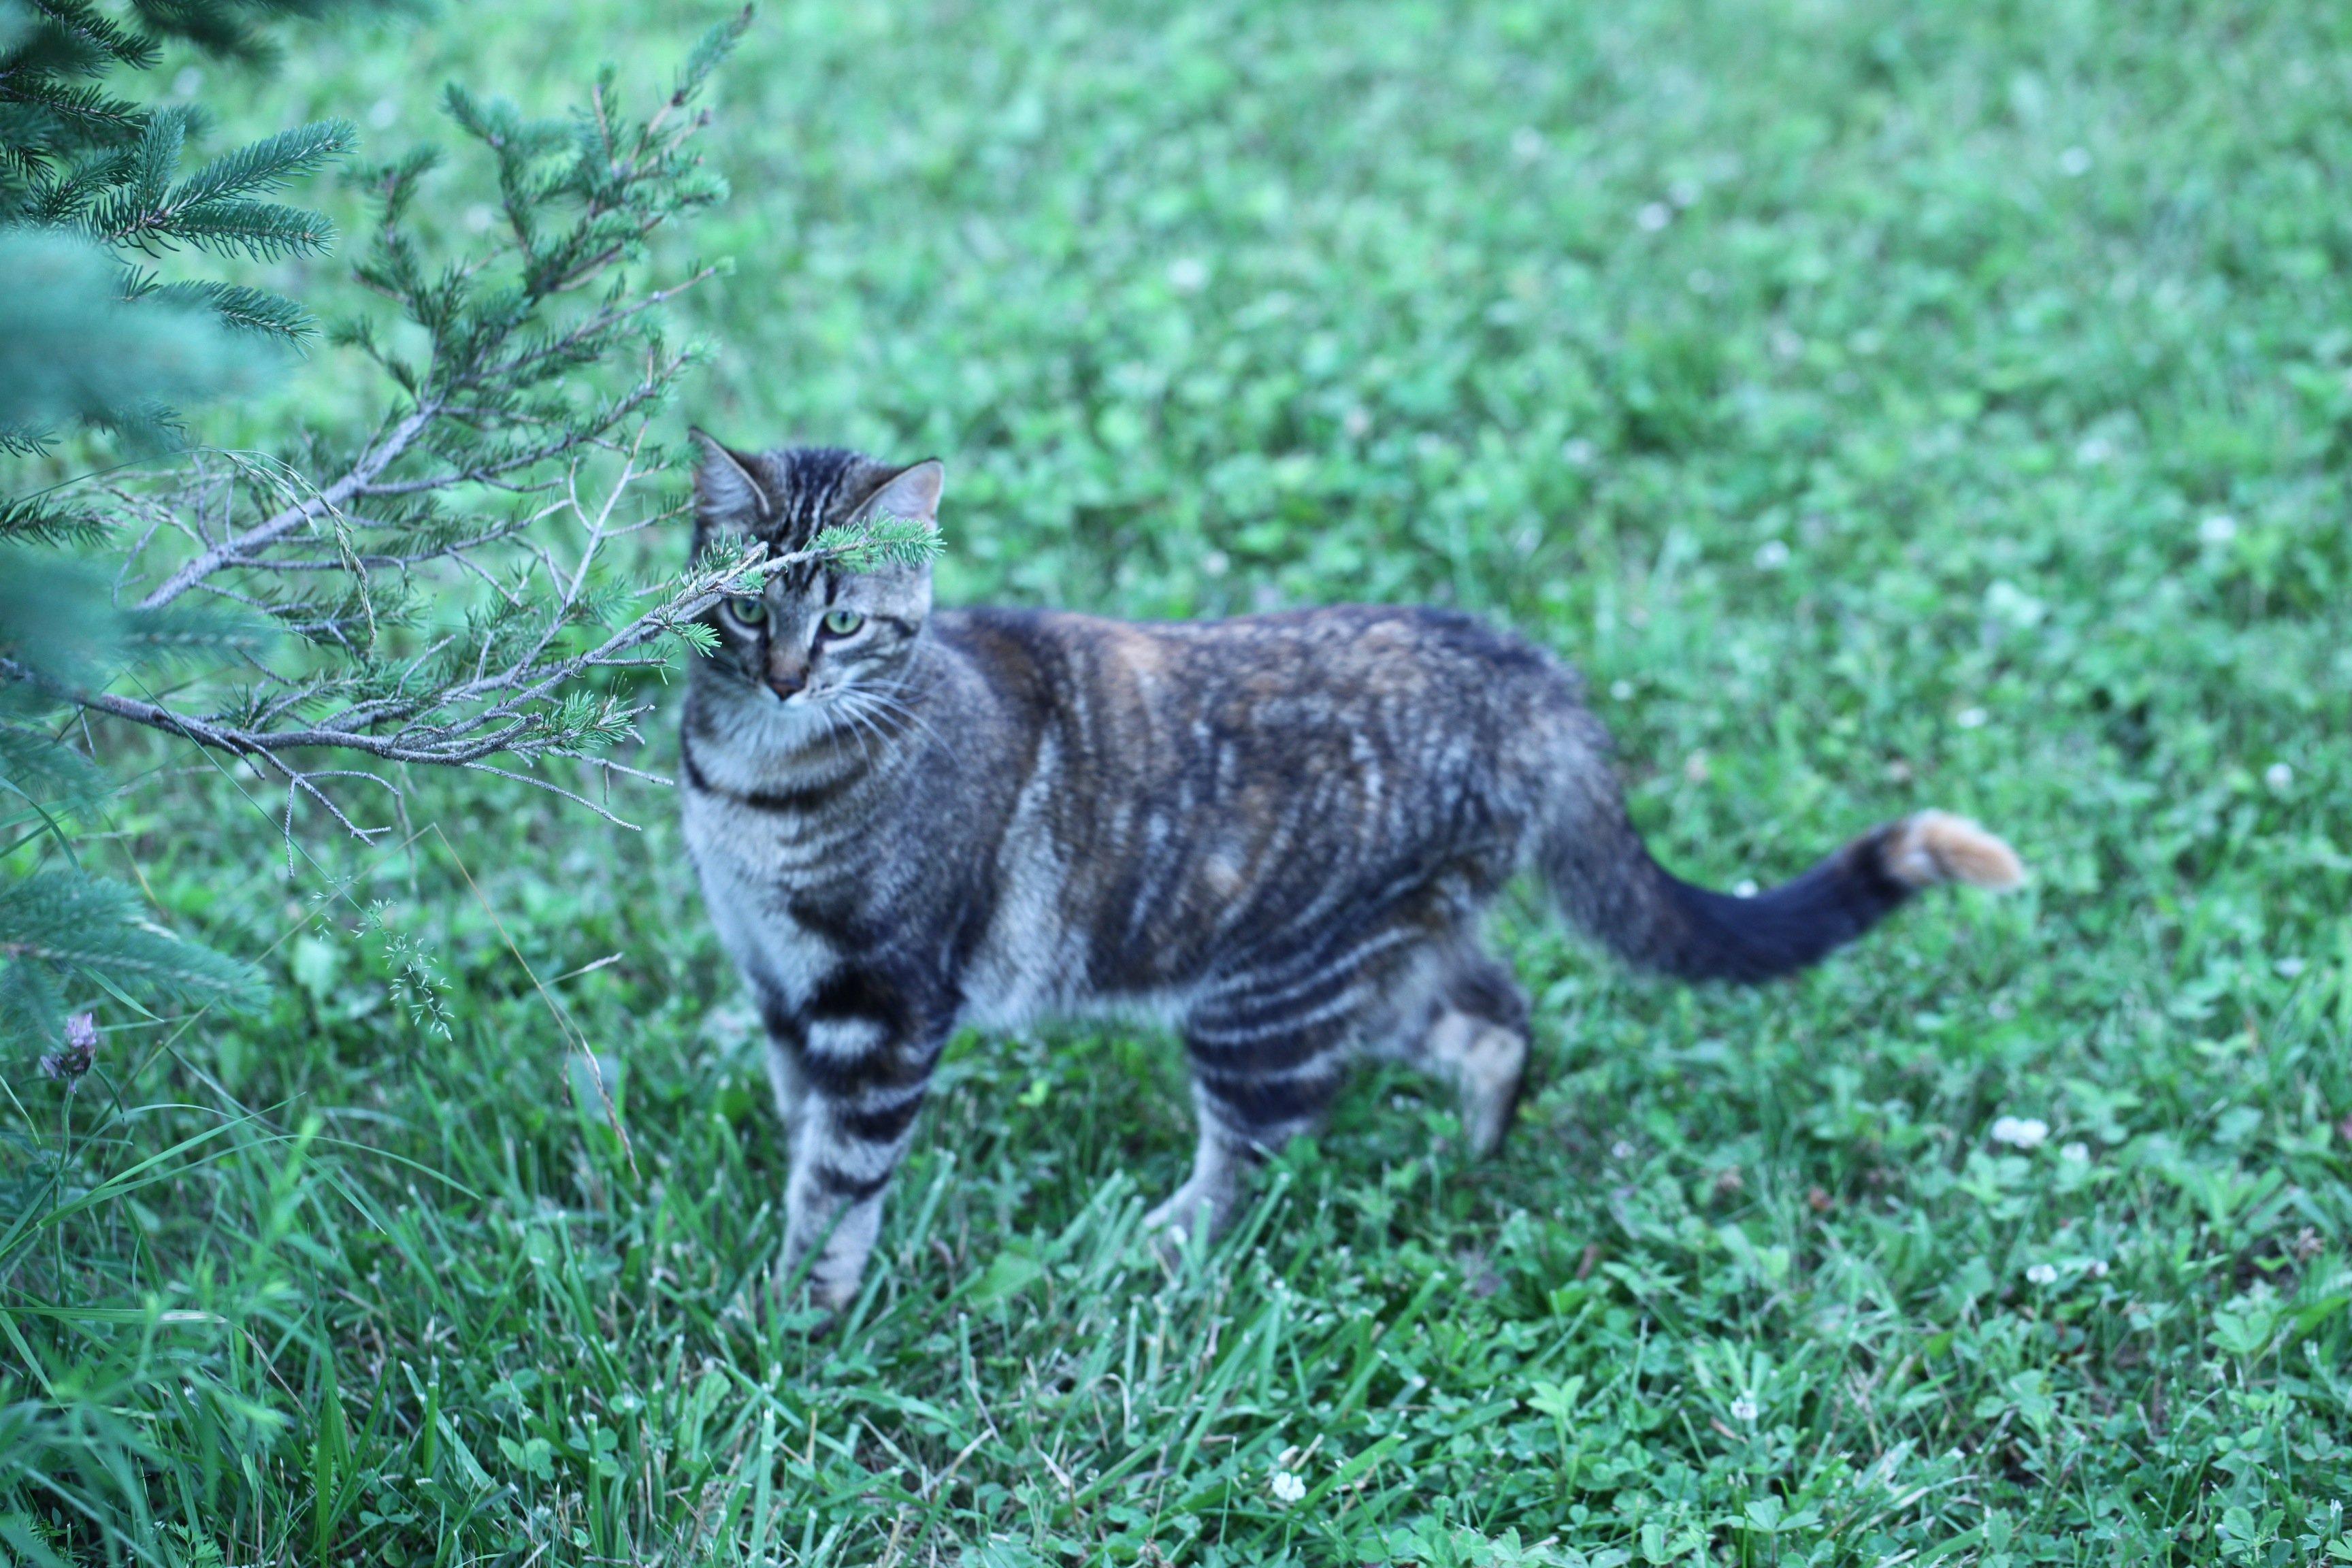 Jolie the wonder kitty